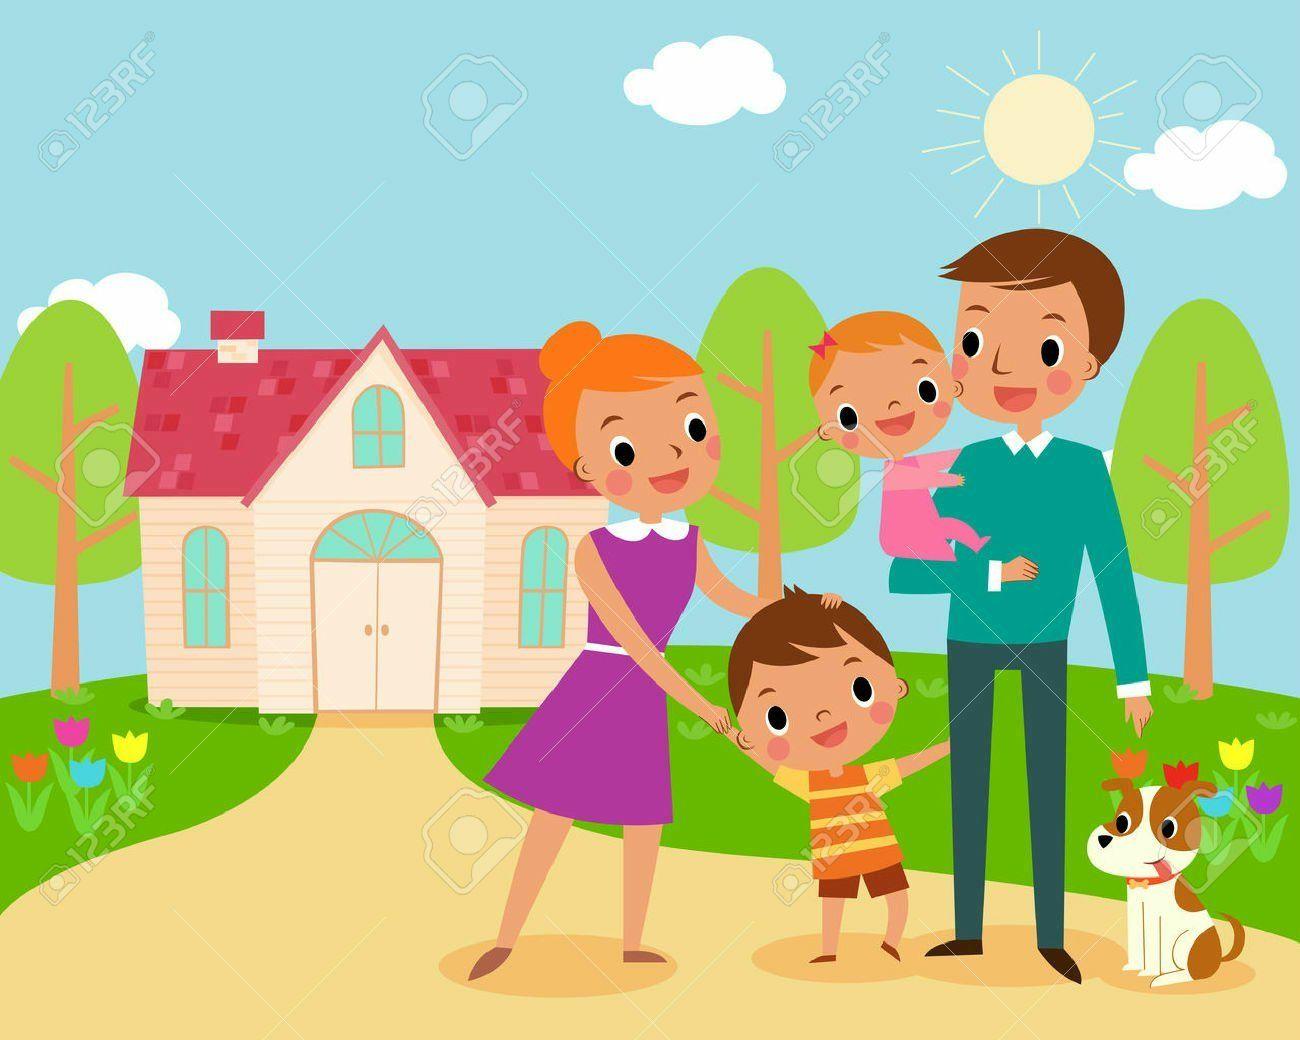 happy-family-at-home-clipart-1-happy-family